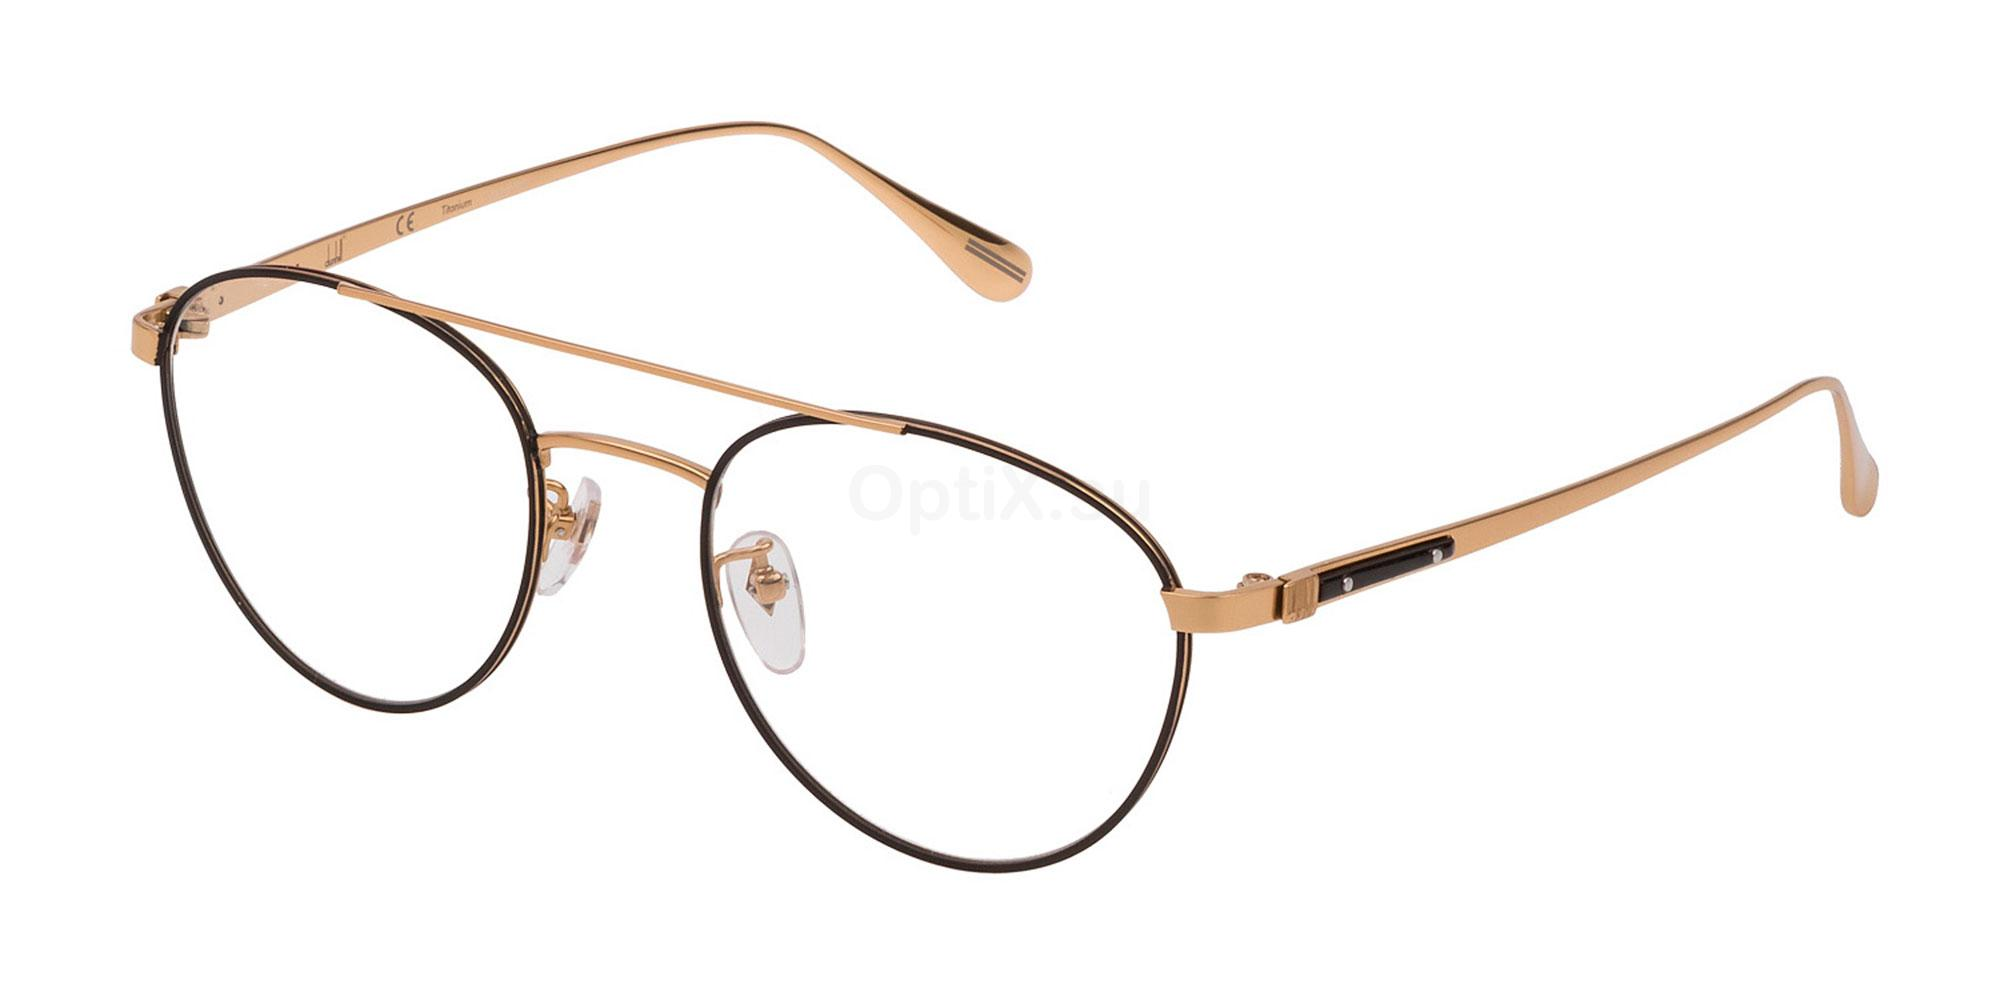 0302 VDH167G Glasses, Dunhill London